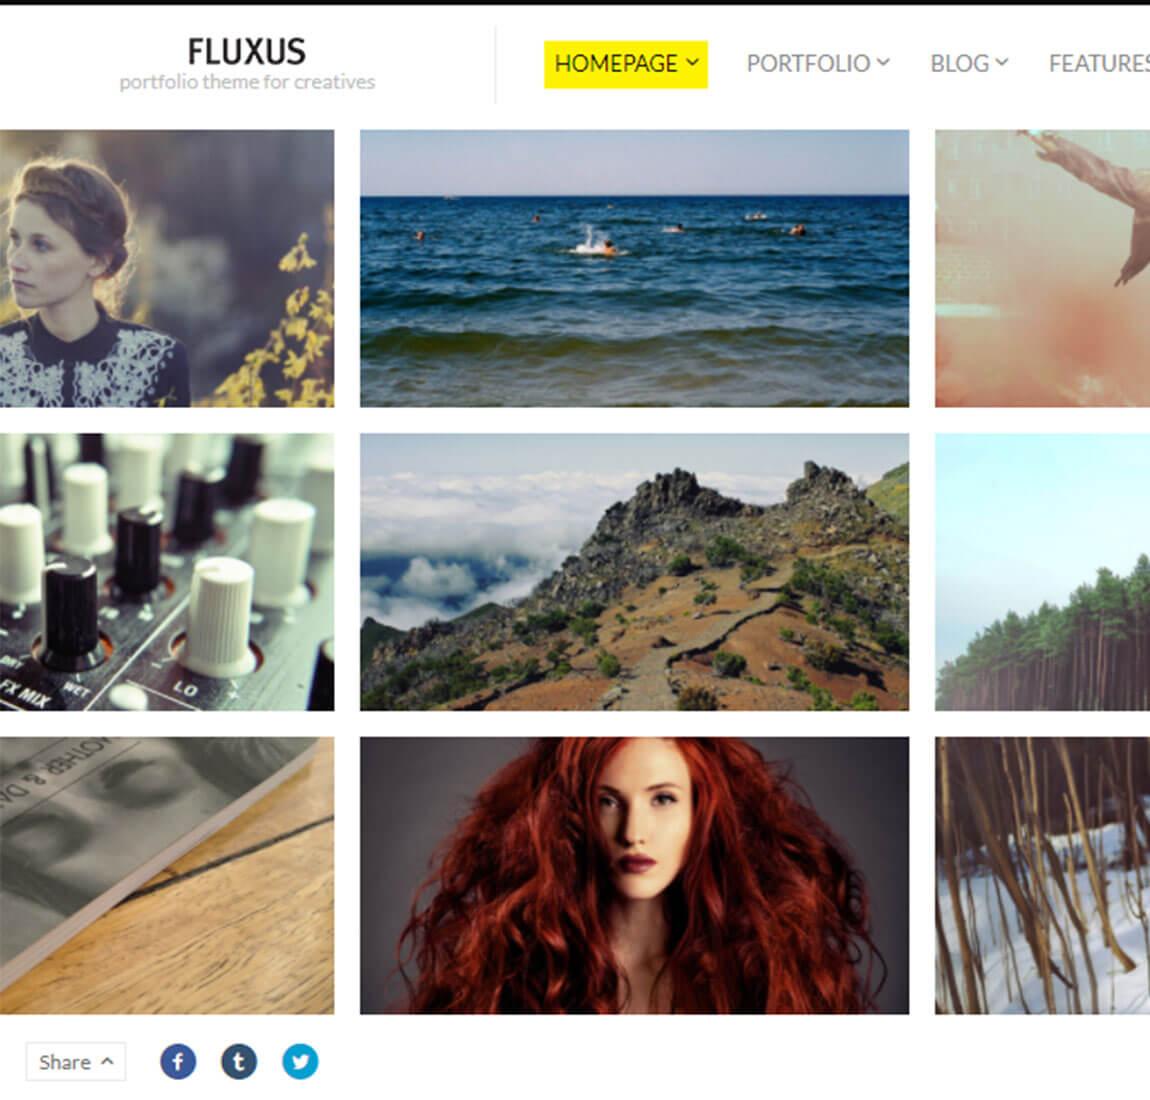 Portfolio-Homepage-Fluxus-wordpress-theme